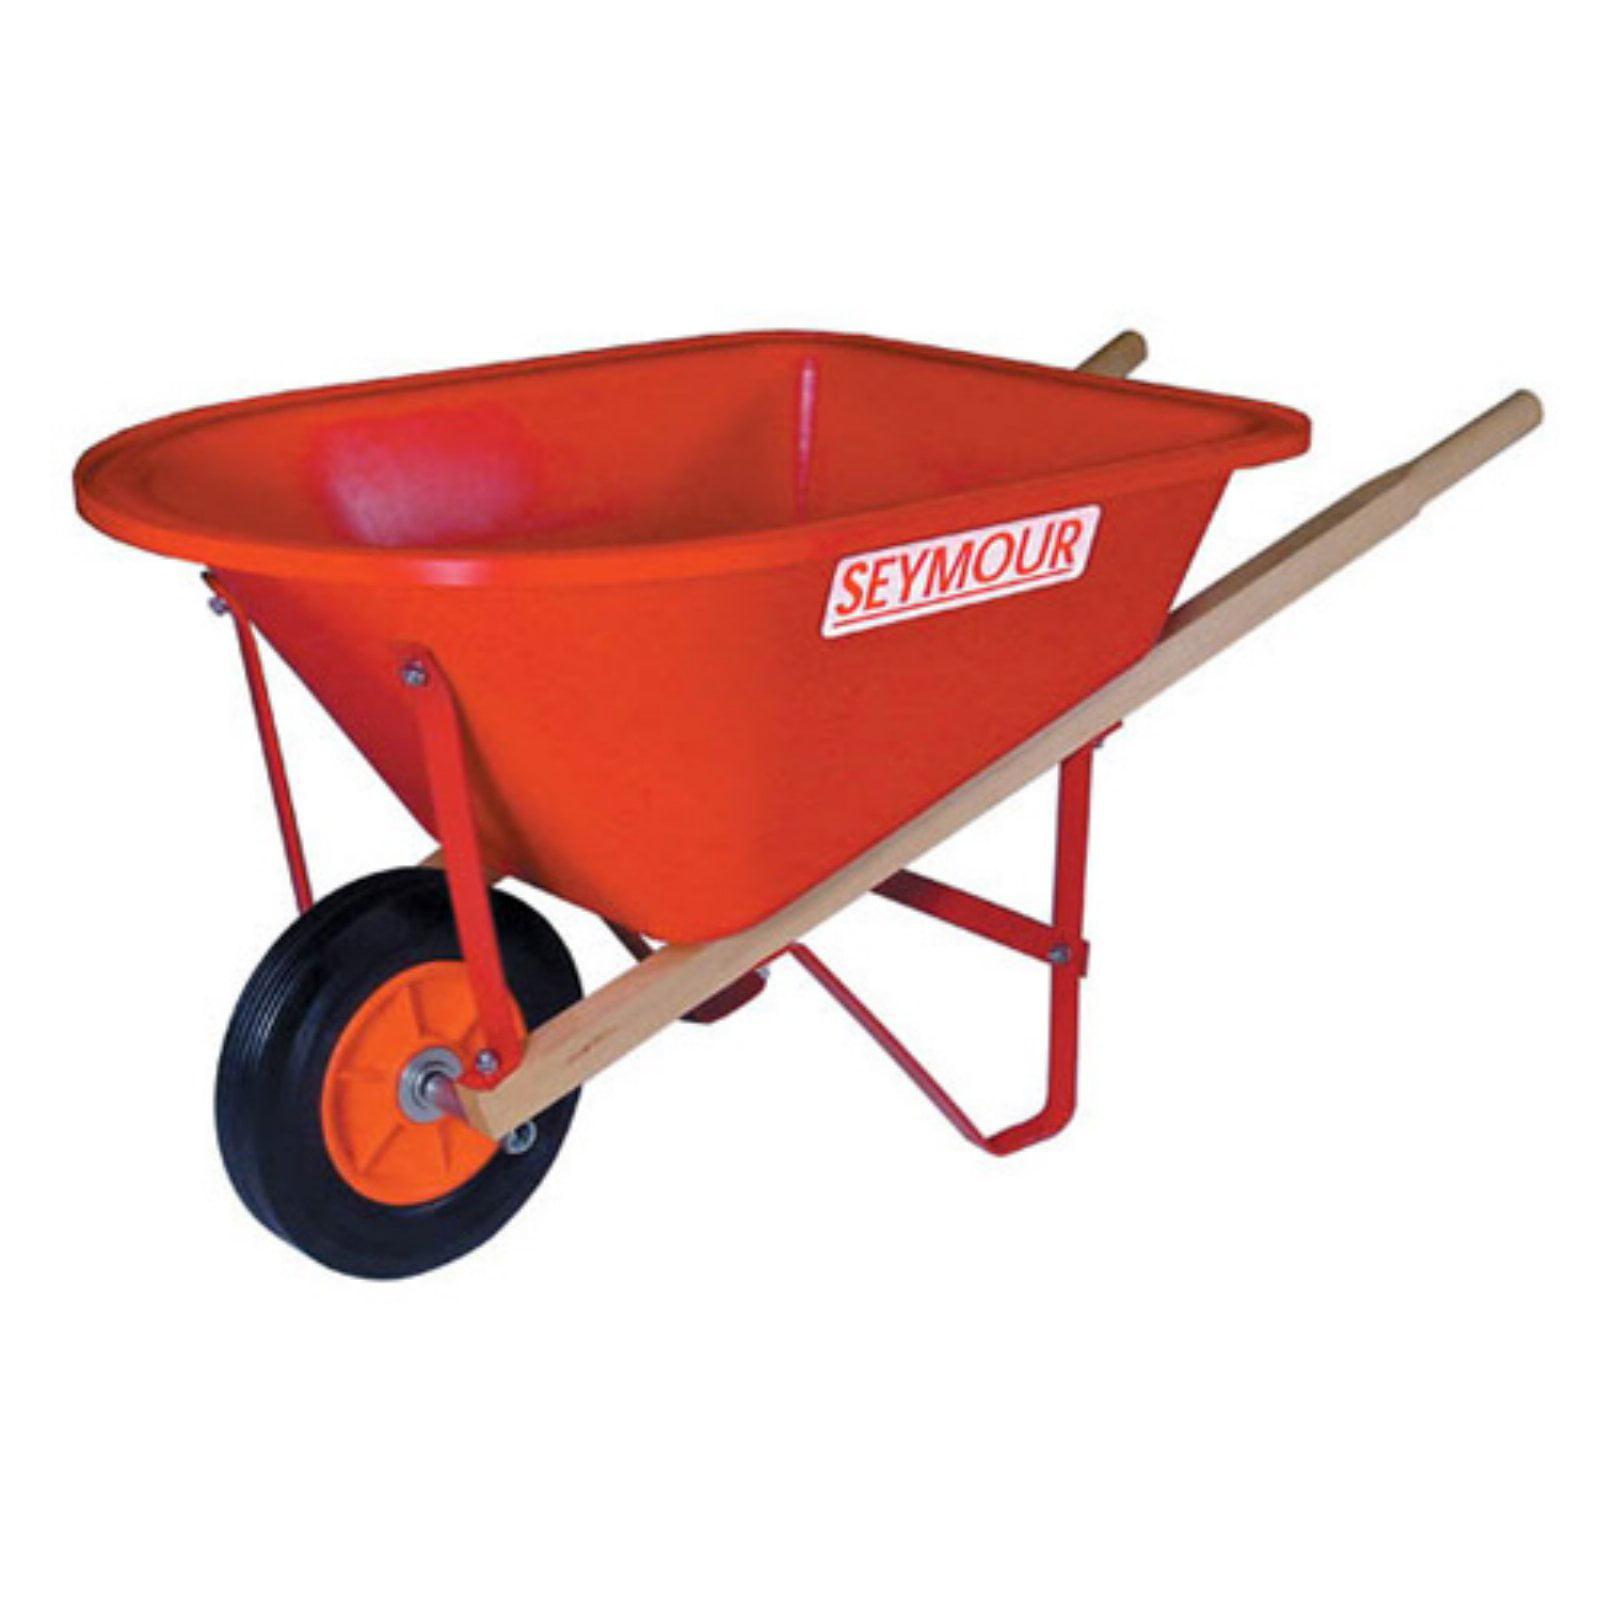 Seymour WB-JR 85720 Children's Wheelbarrow